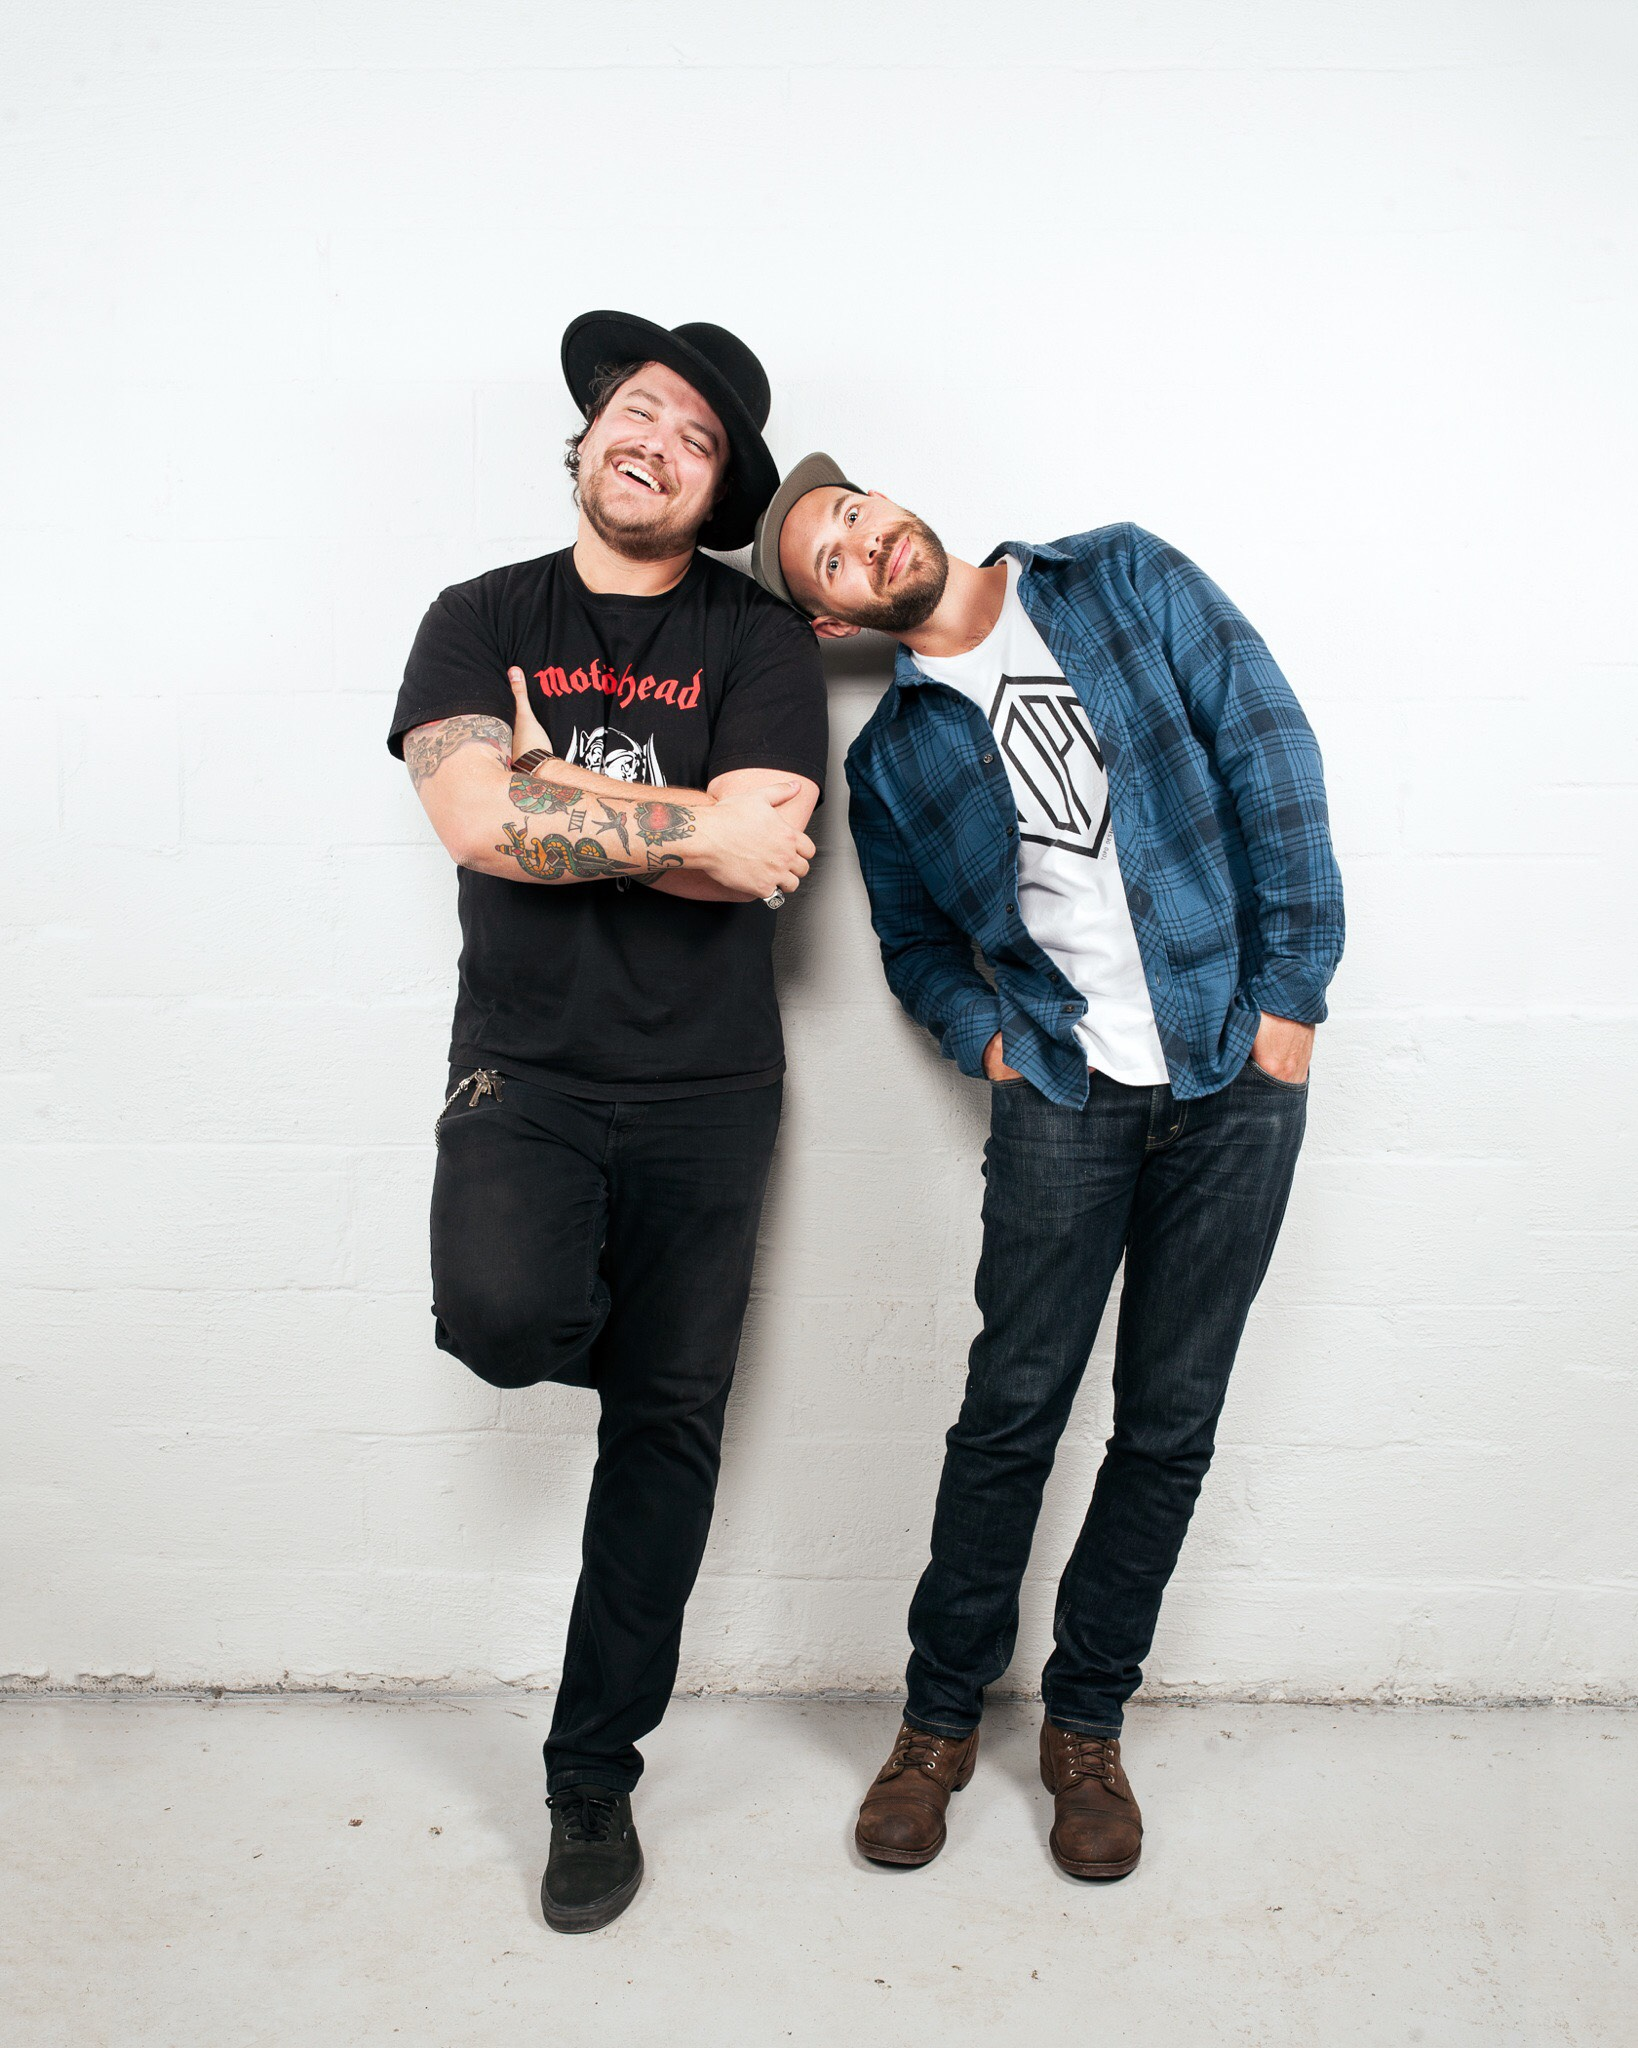 Alexandre Brault (left) & Ryan Gillies (right) - TheMotoSocialOTTAWA